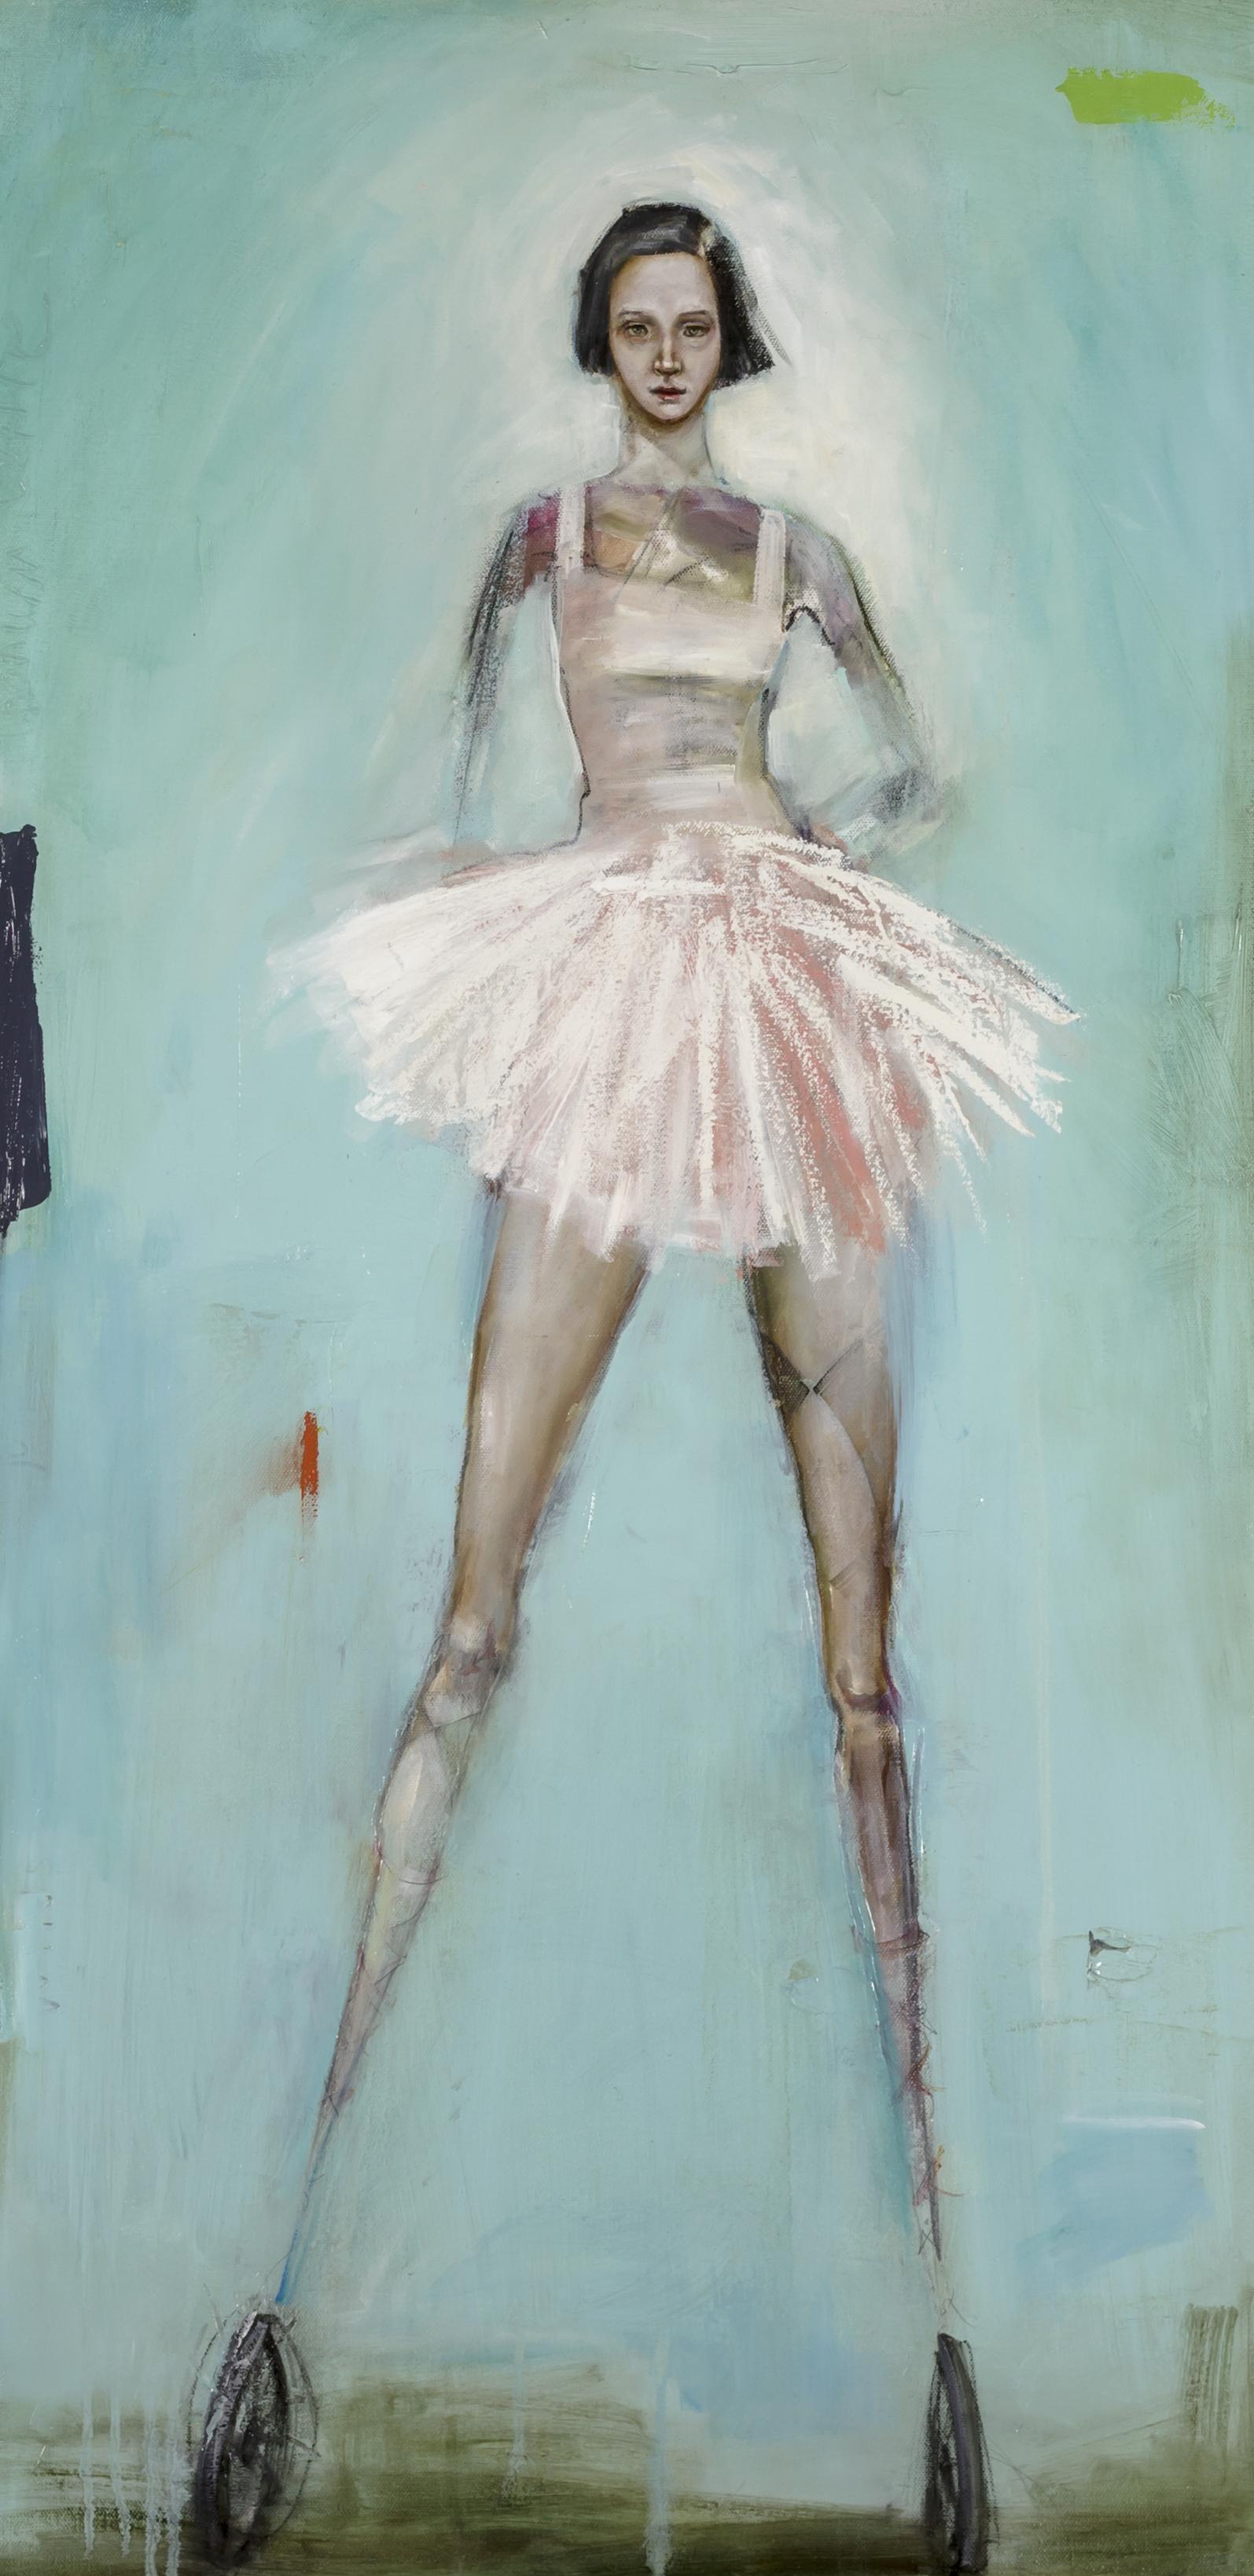 "Fortuna  Oil and enamel on canvas - 2017 - 39"" x 29.7"" / 100 x 50 cm"